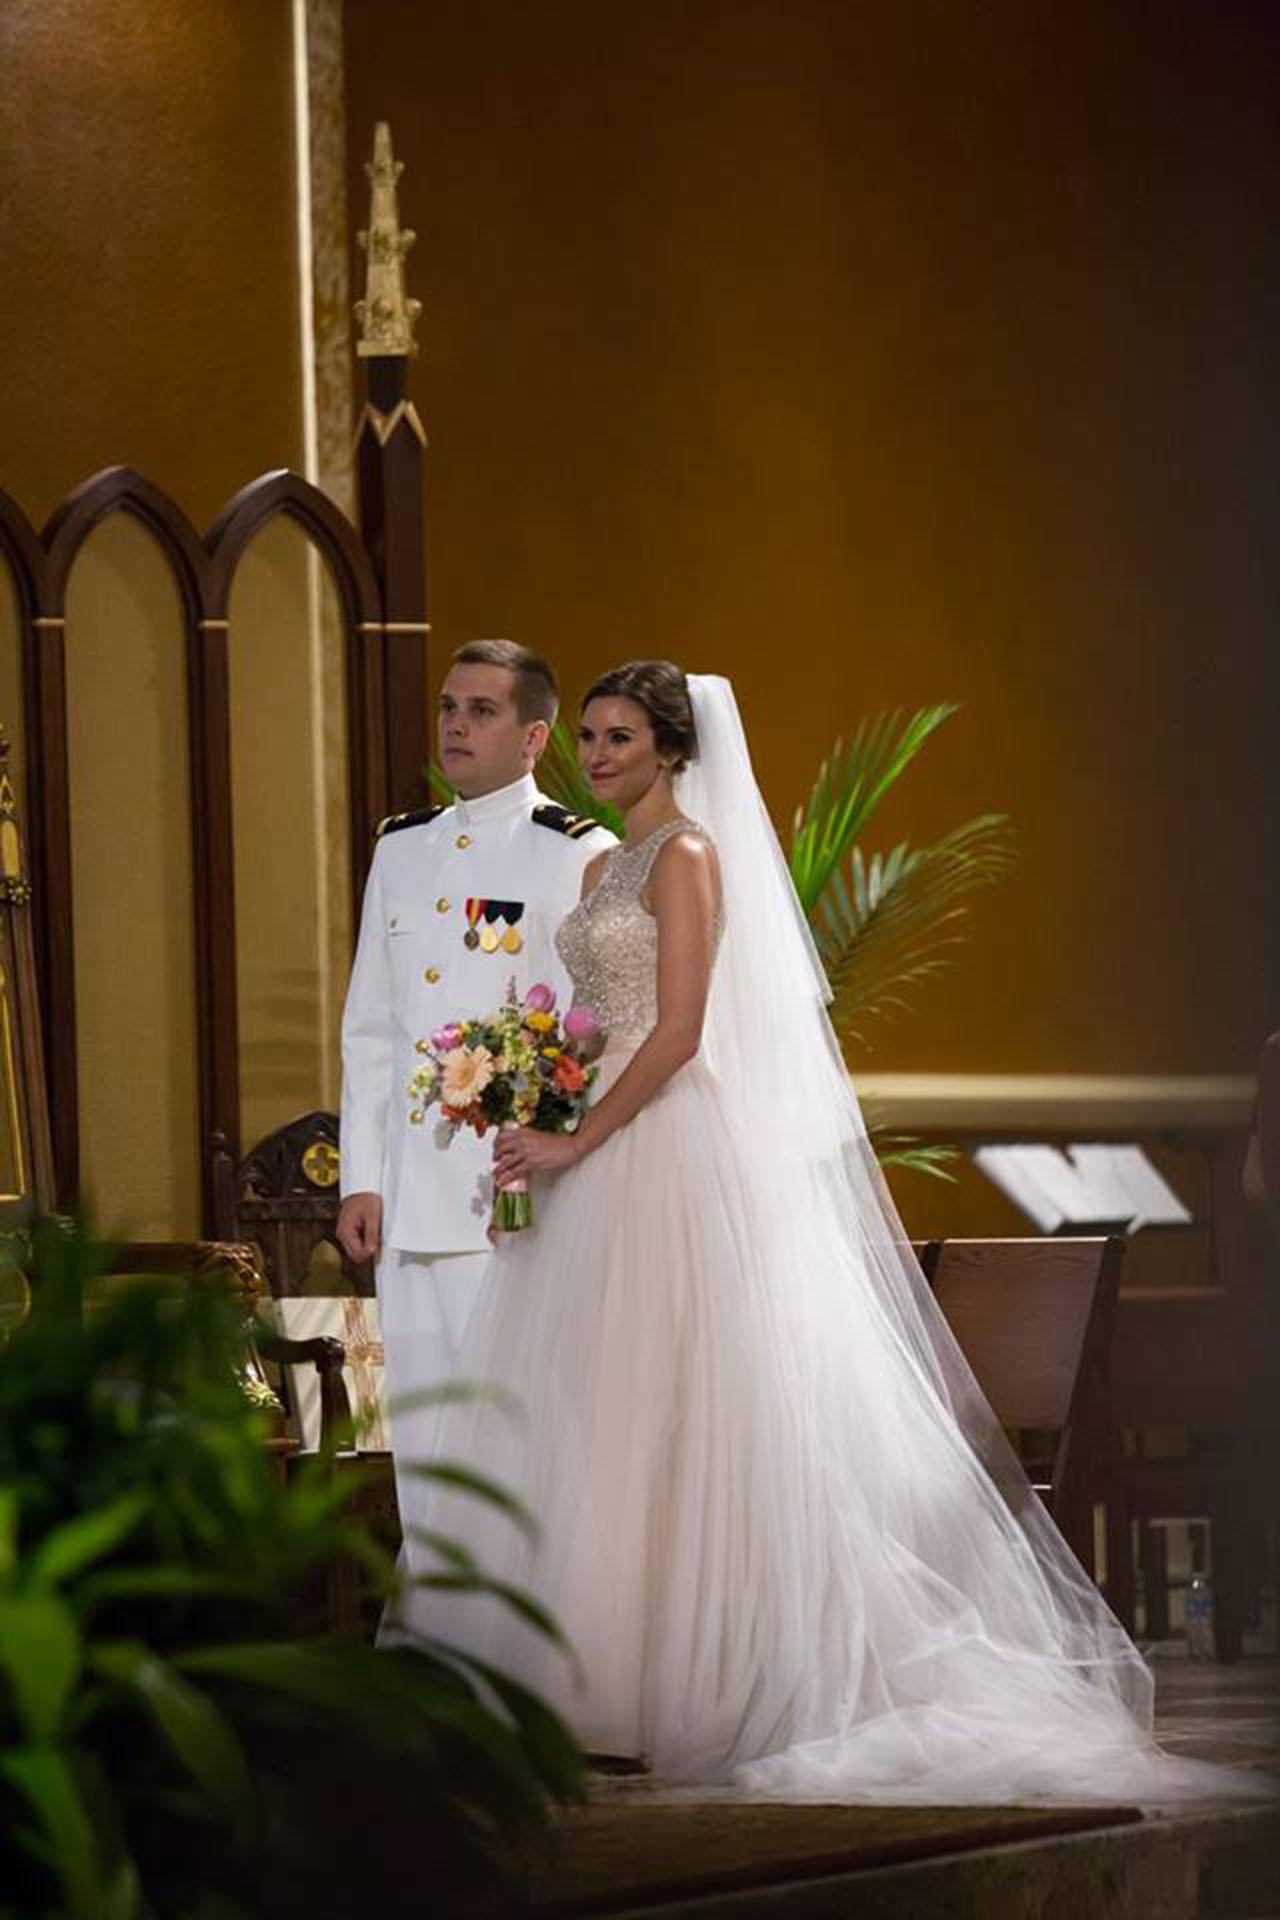 Leslie and Evan wedding photos